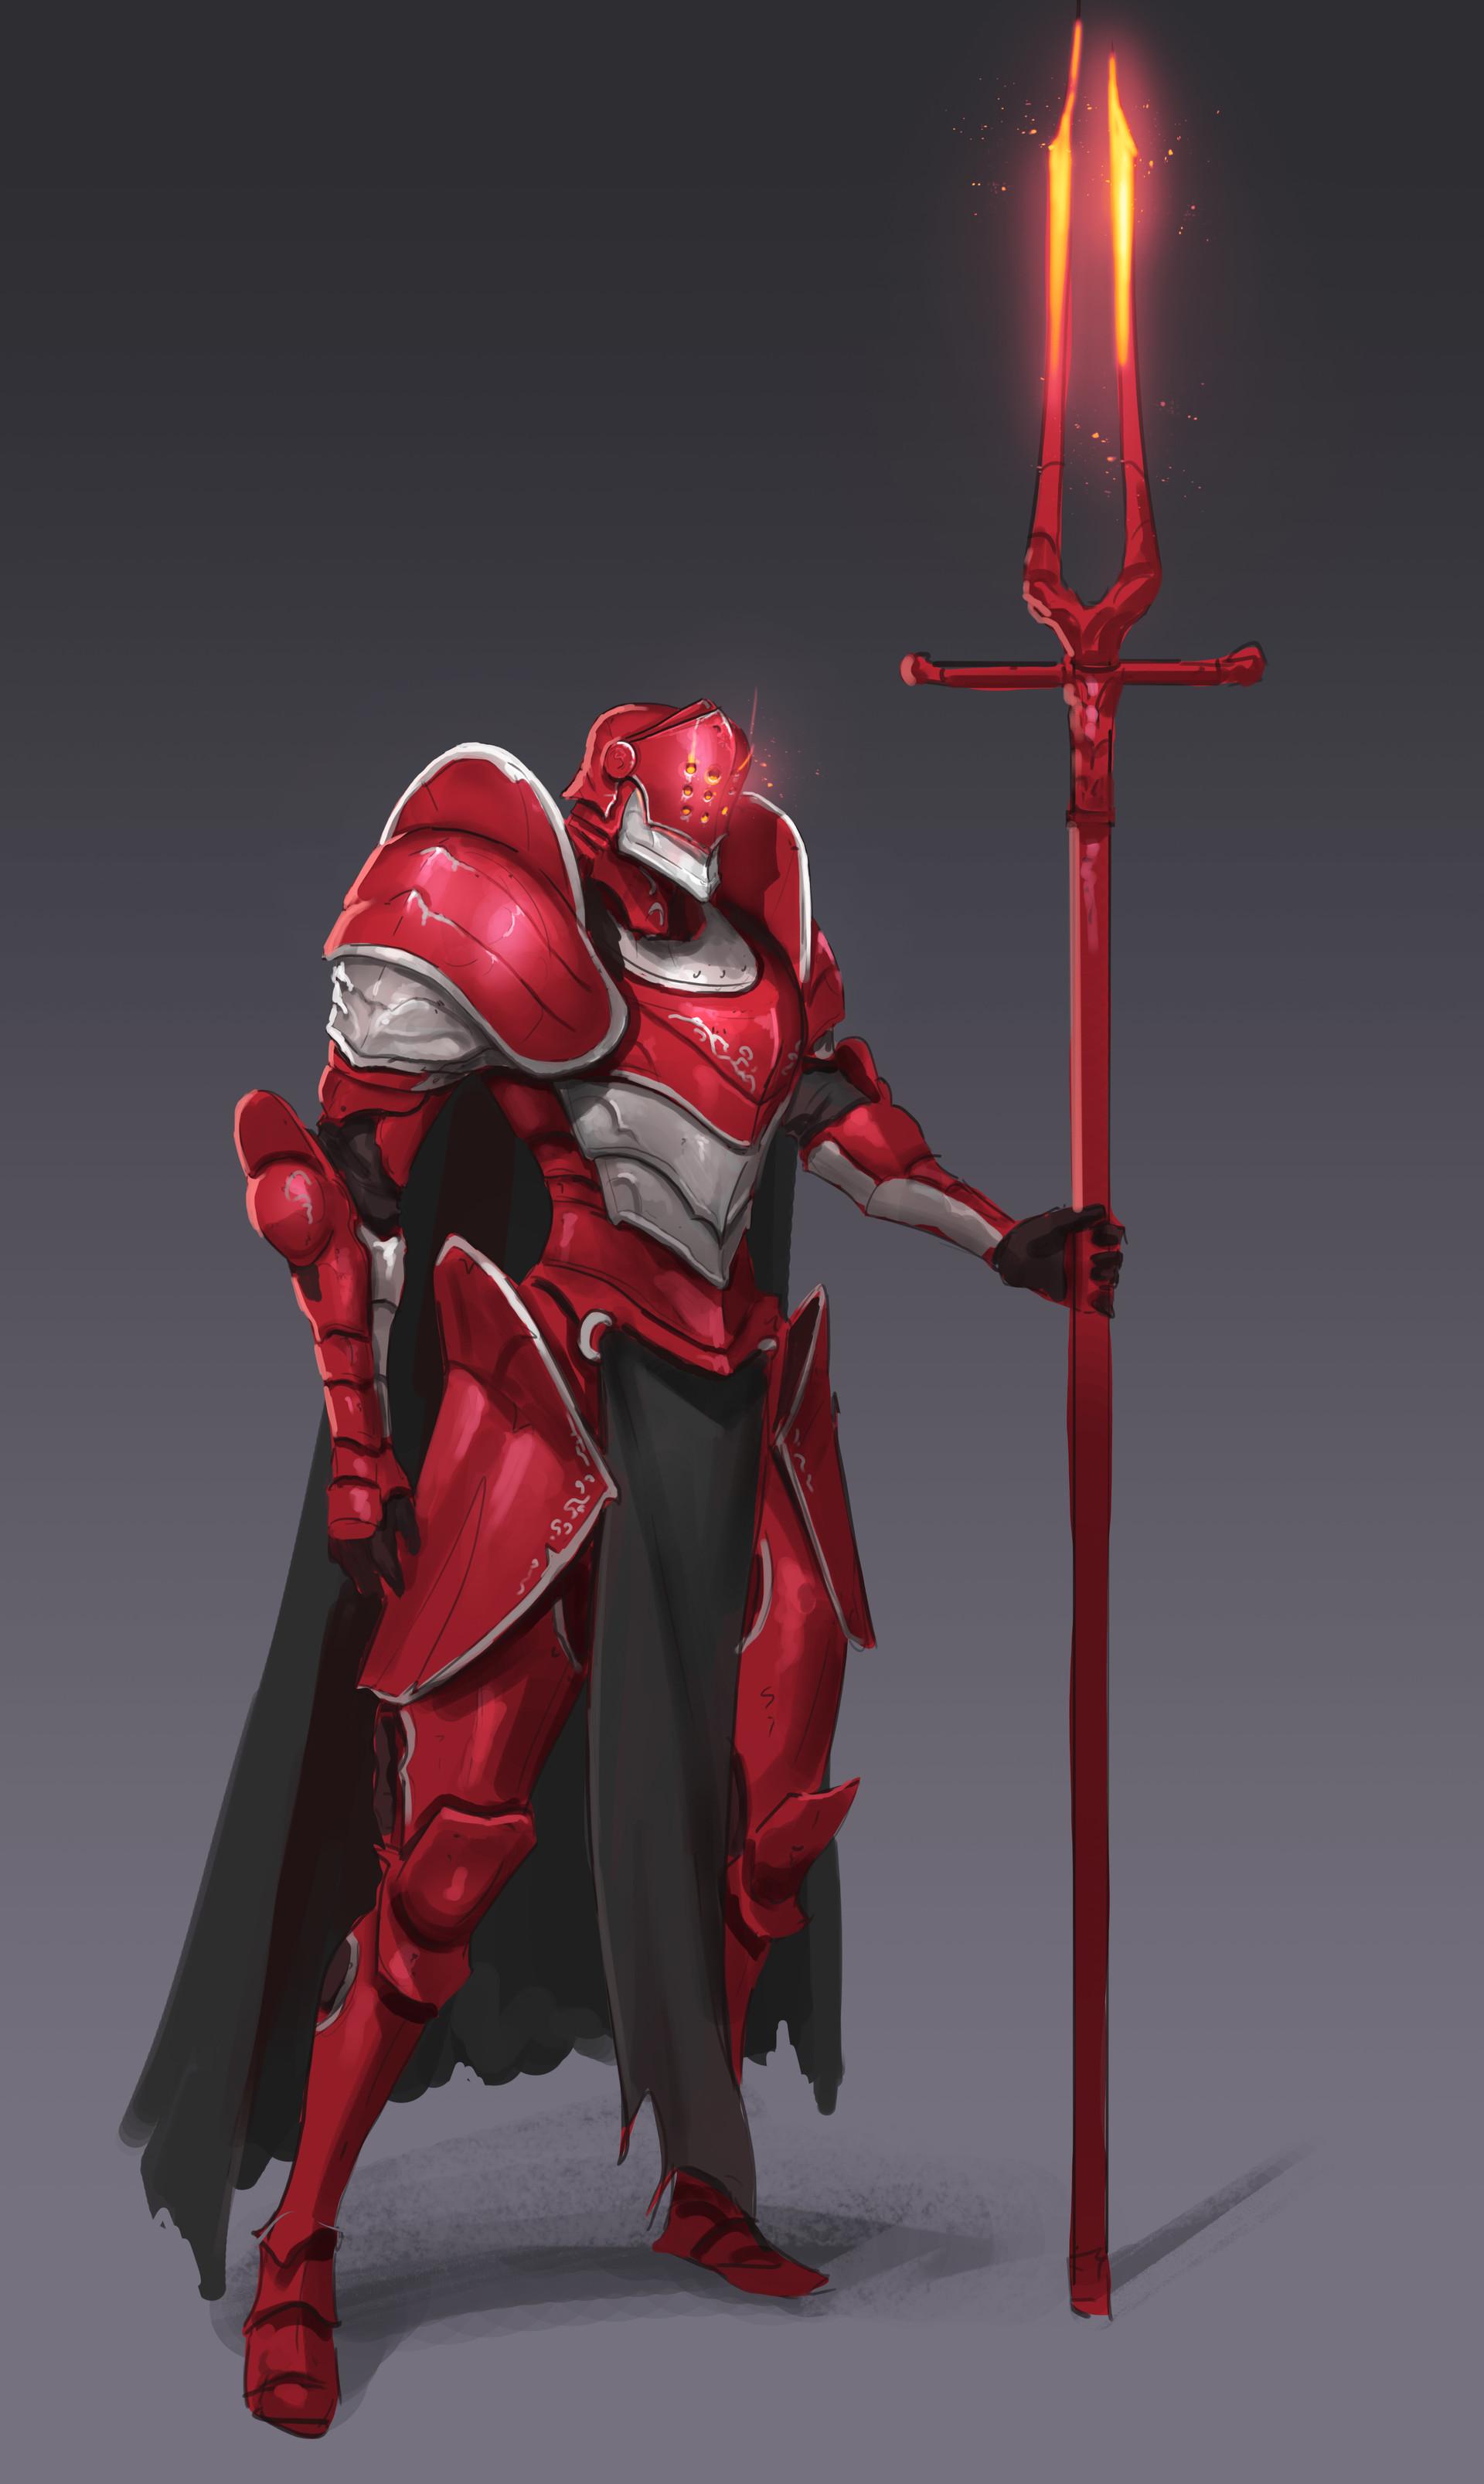 Evangelion Armor Concept Art